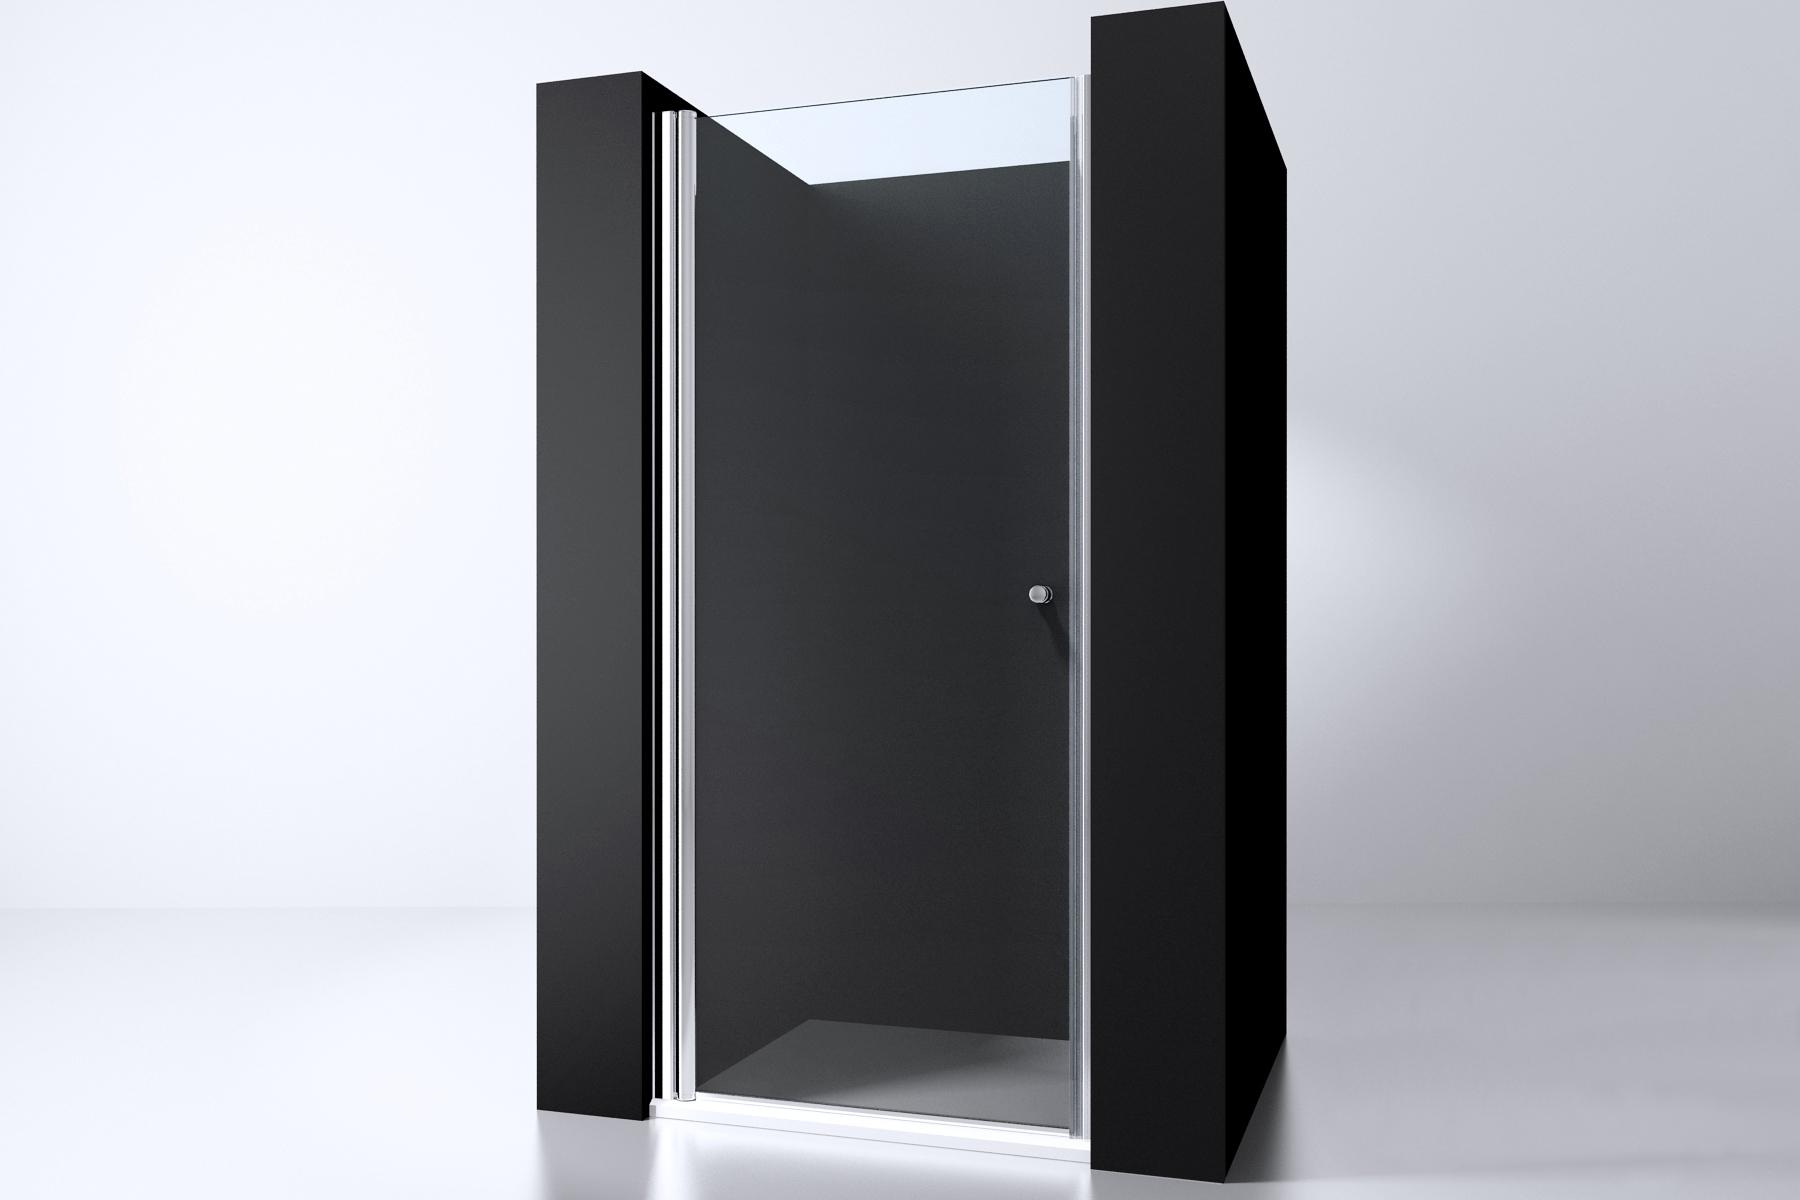 Best design erico nisdeur met profiel 97 100cm h=200cm nano glas 6mm